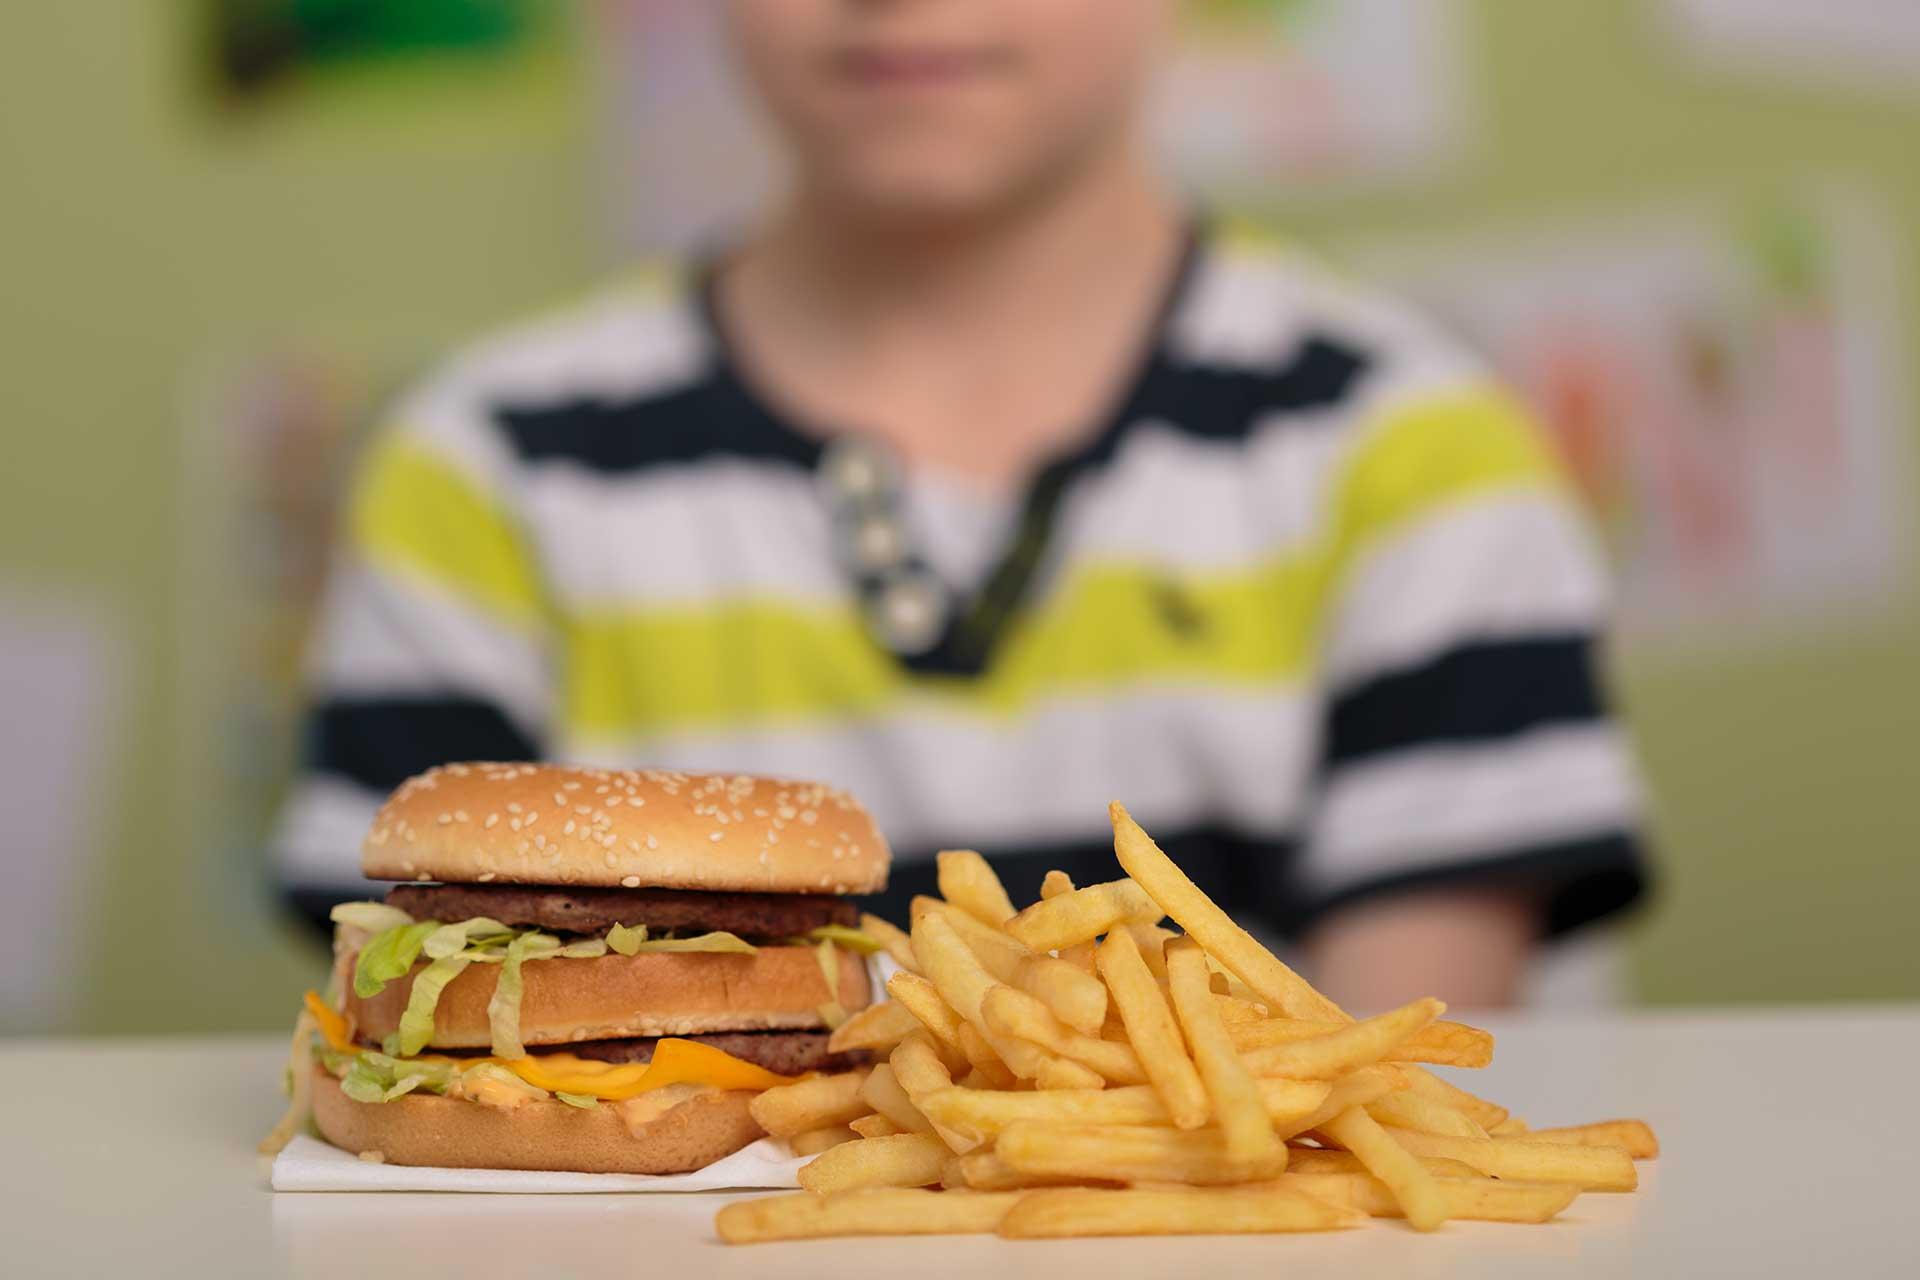 Kicking-the-fast-food-habit